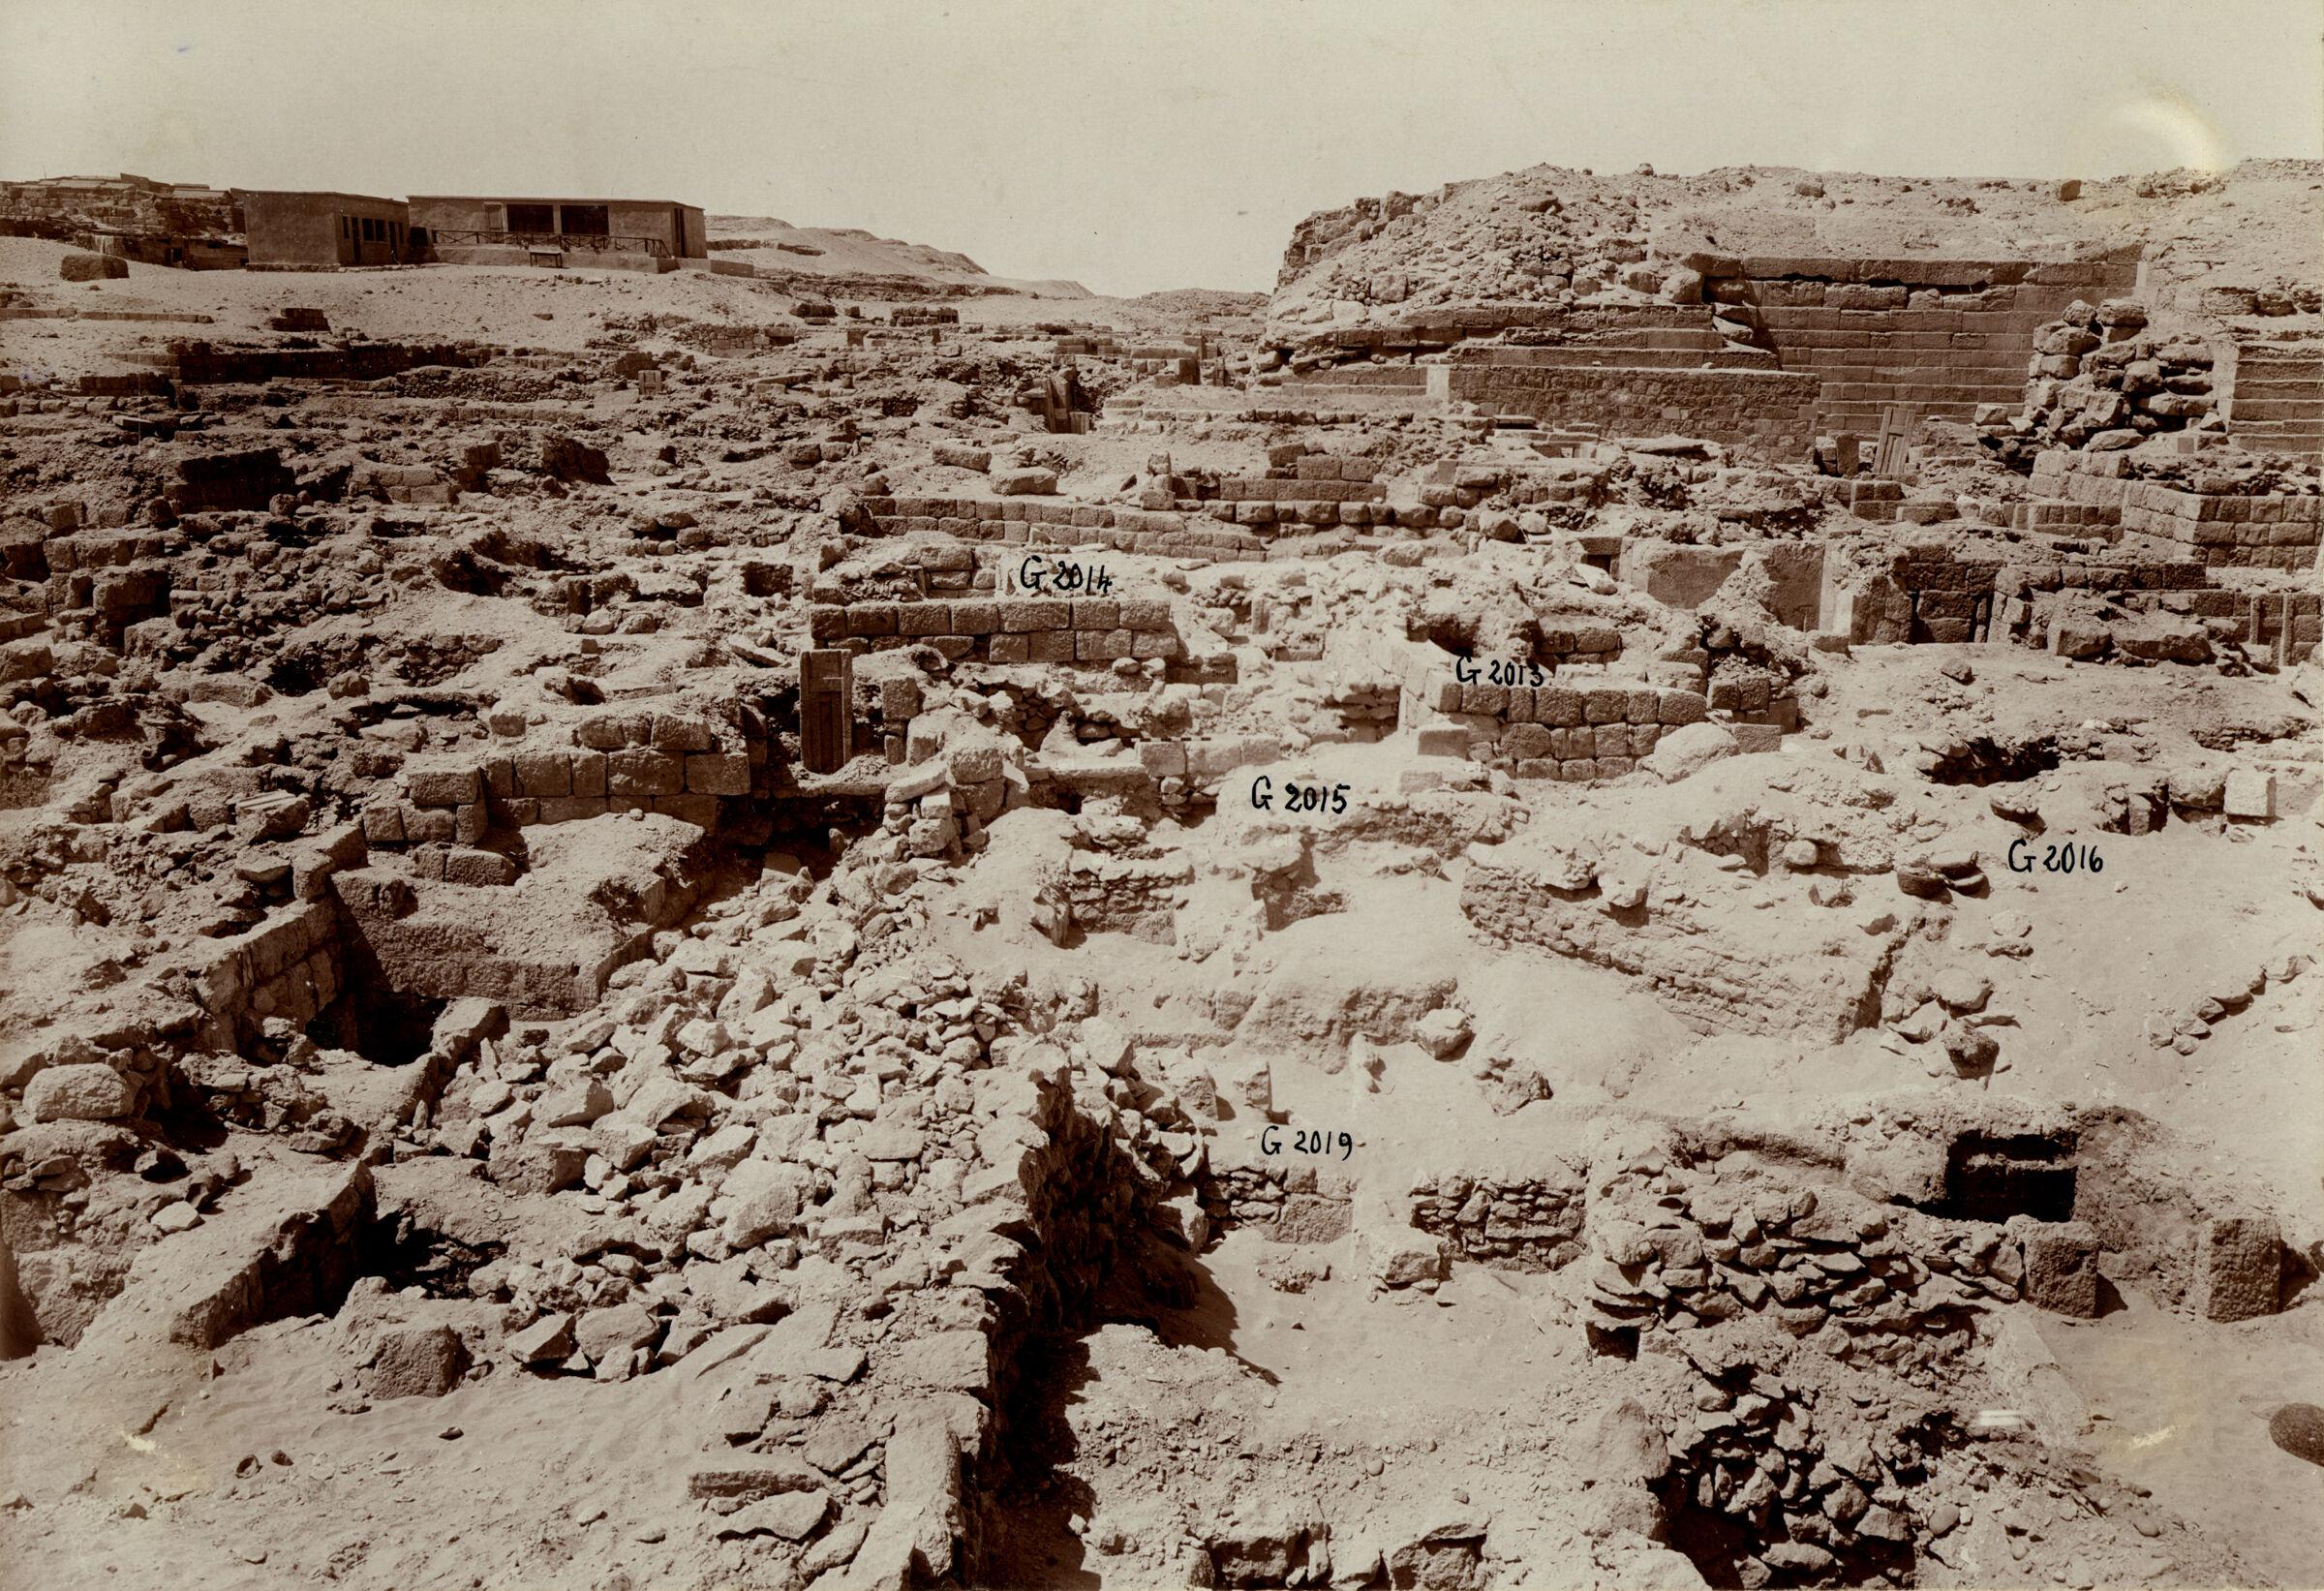 Western Cemetery: Site: Giza; View: G 2017, G 2015, G 2016, G 2014, G 2013